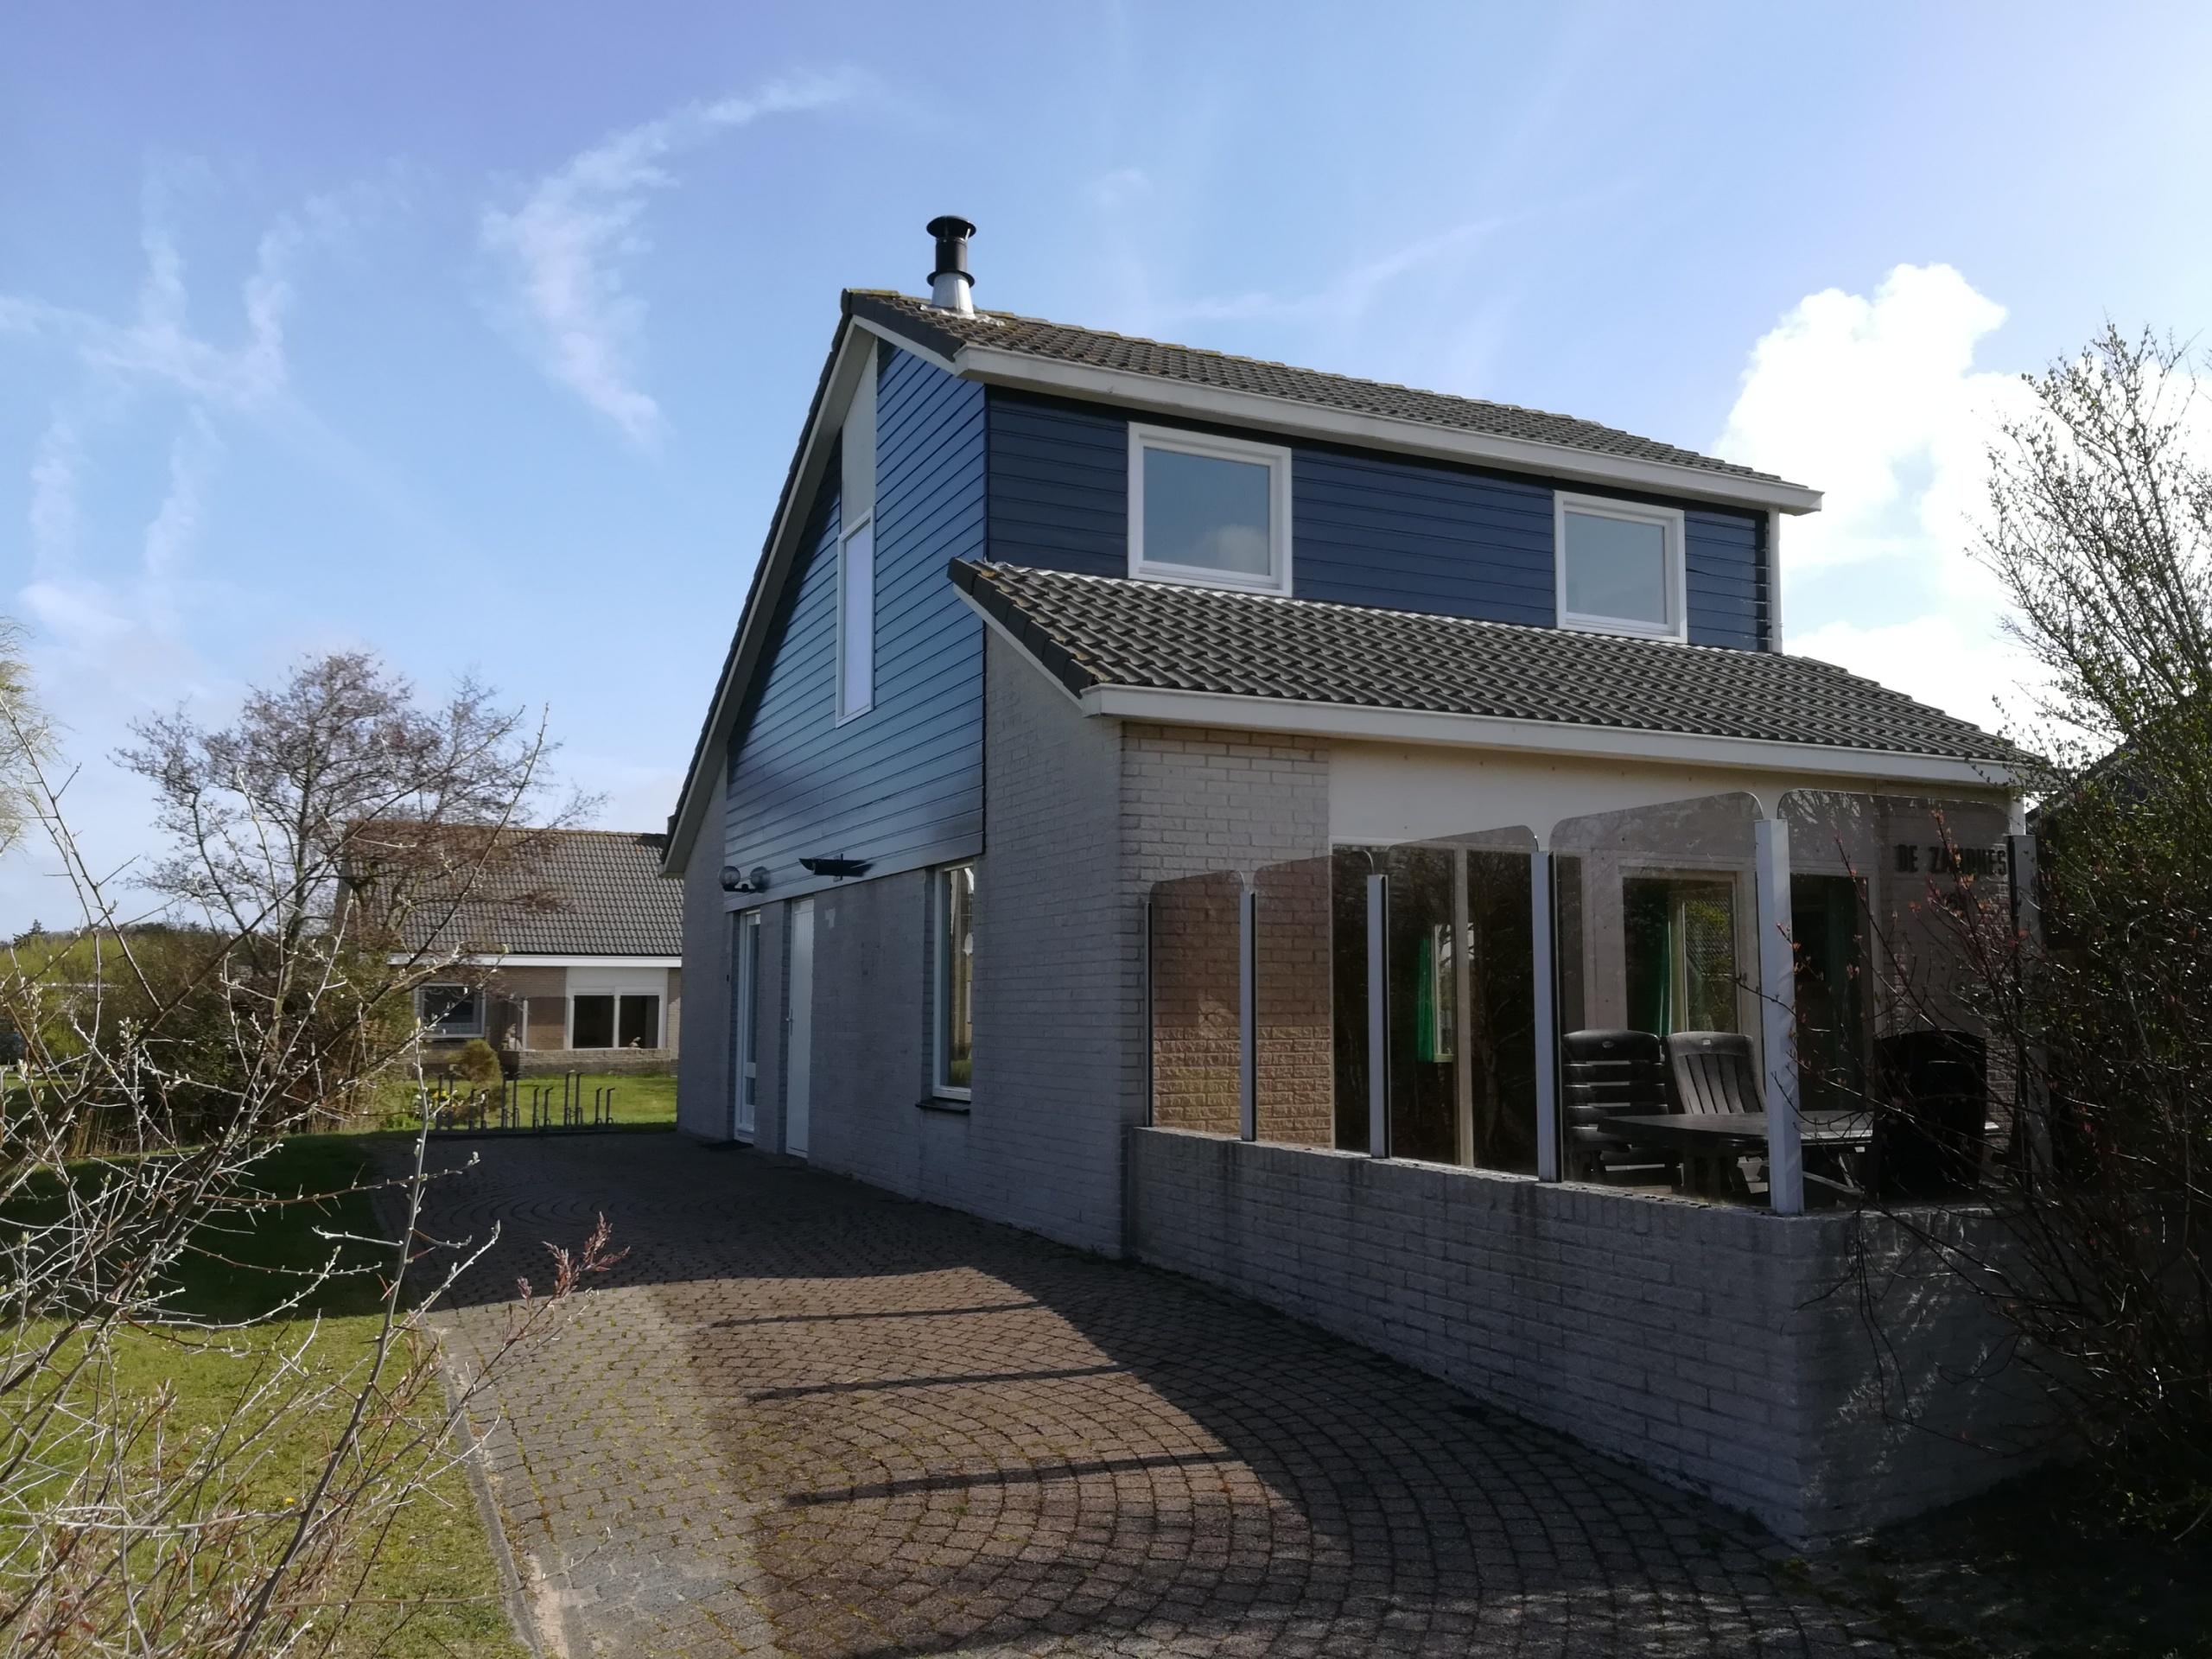 Luxury holiday home in small-scale park near De Koog